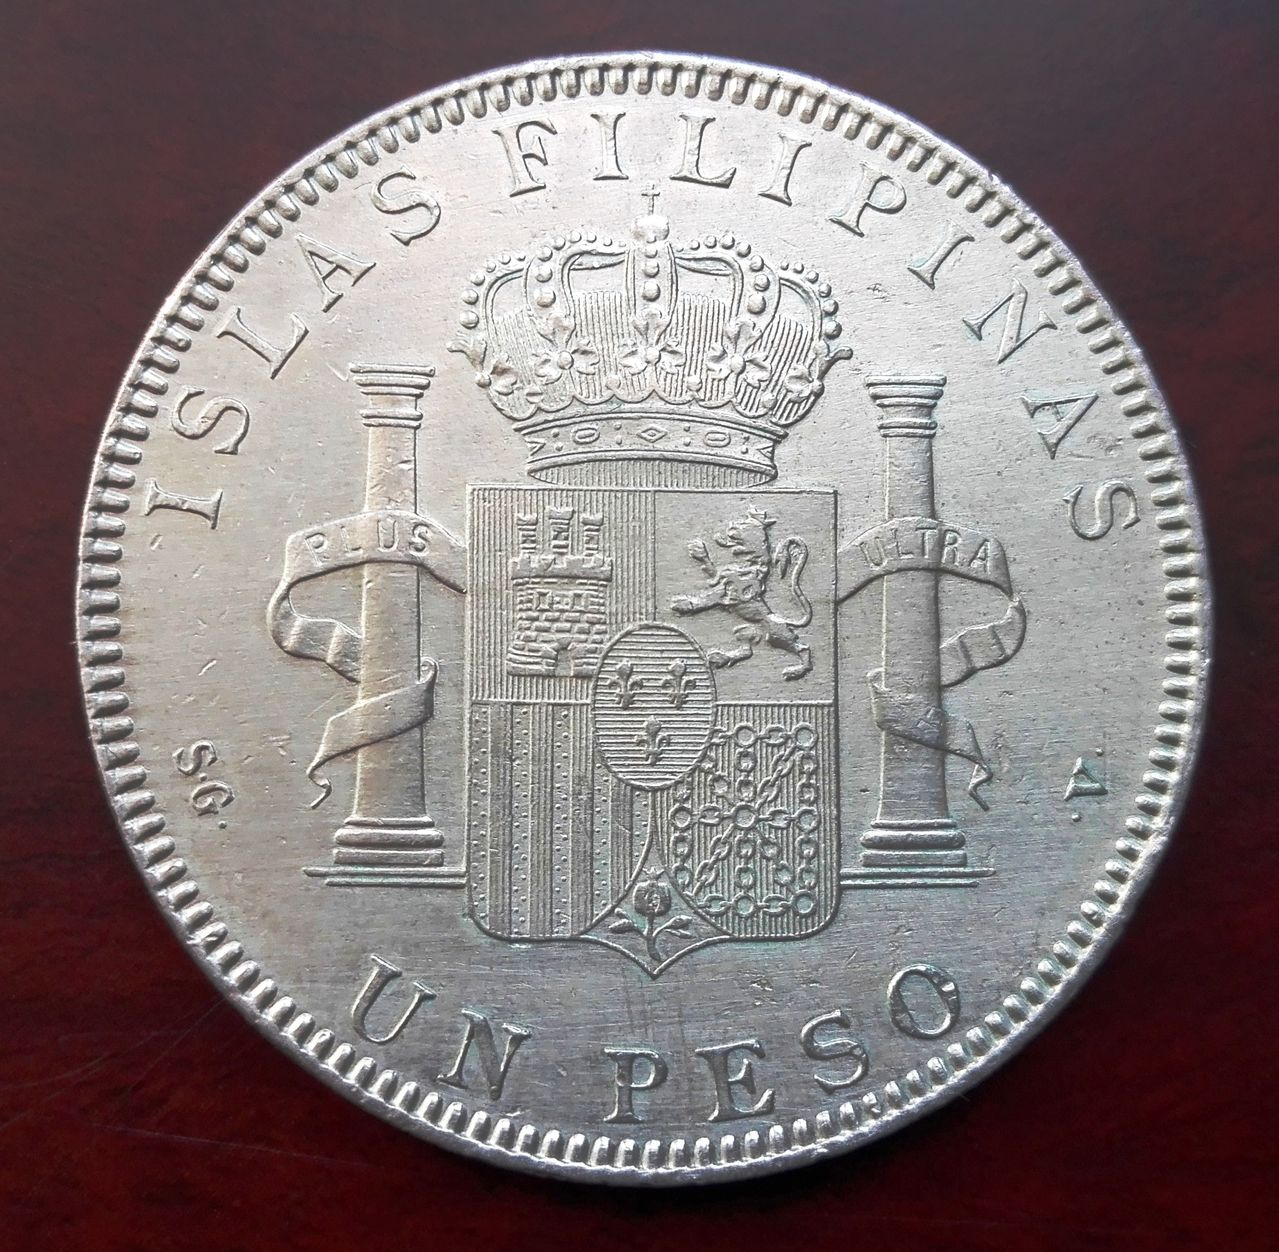 1 peso Filipinas 1897, Alfonso XIII  1_peso_fiolipnas_4